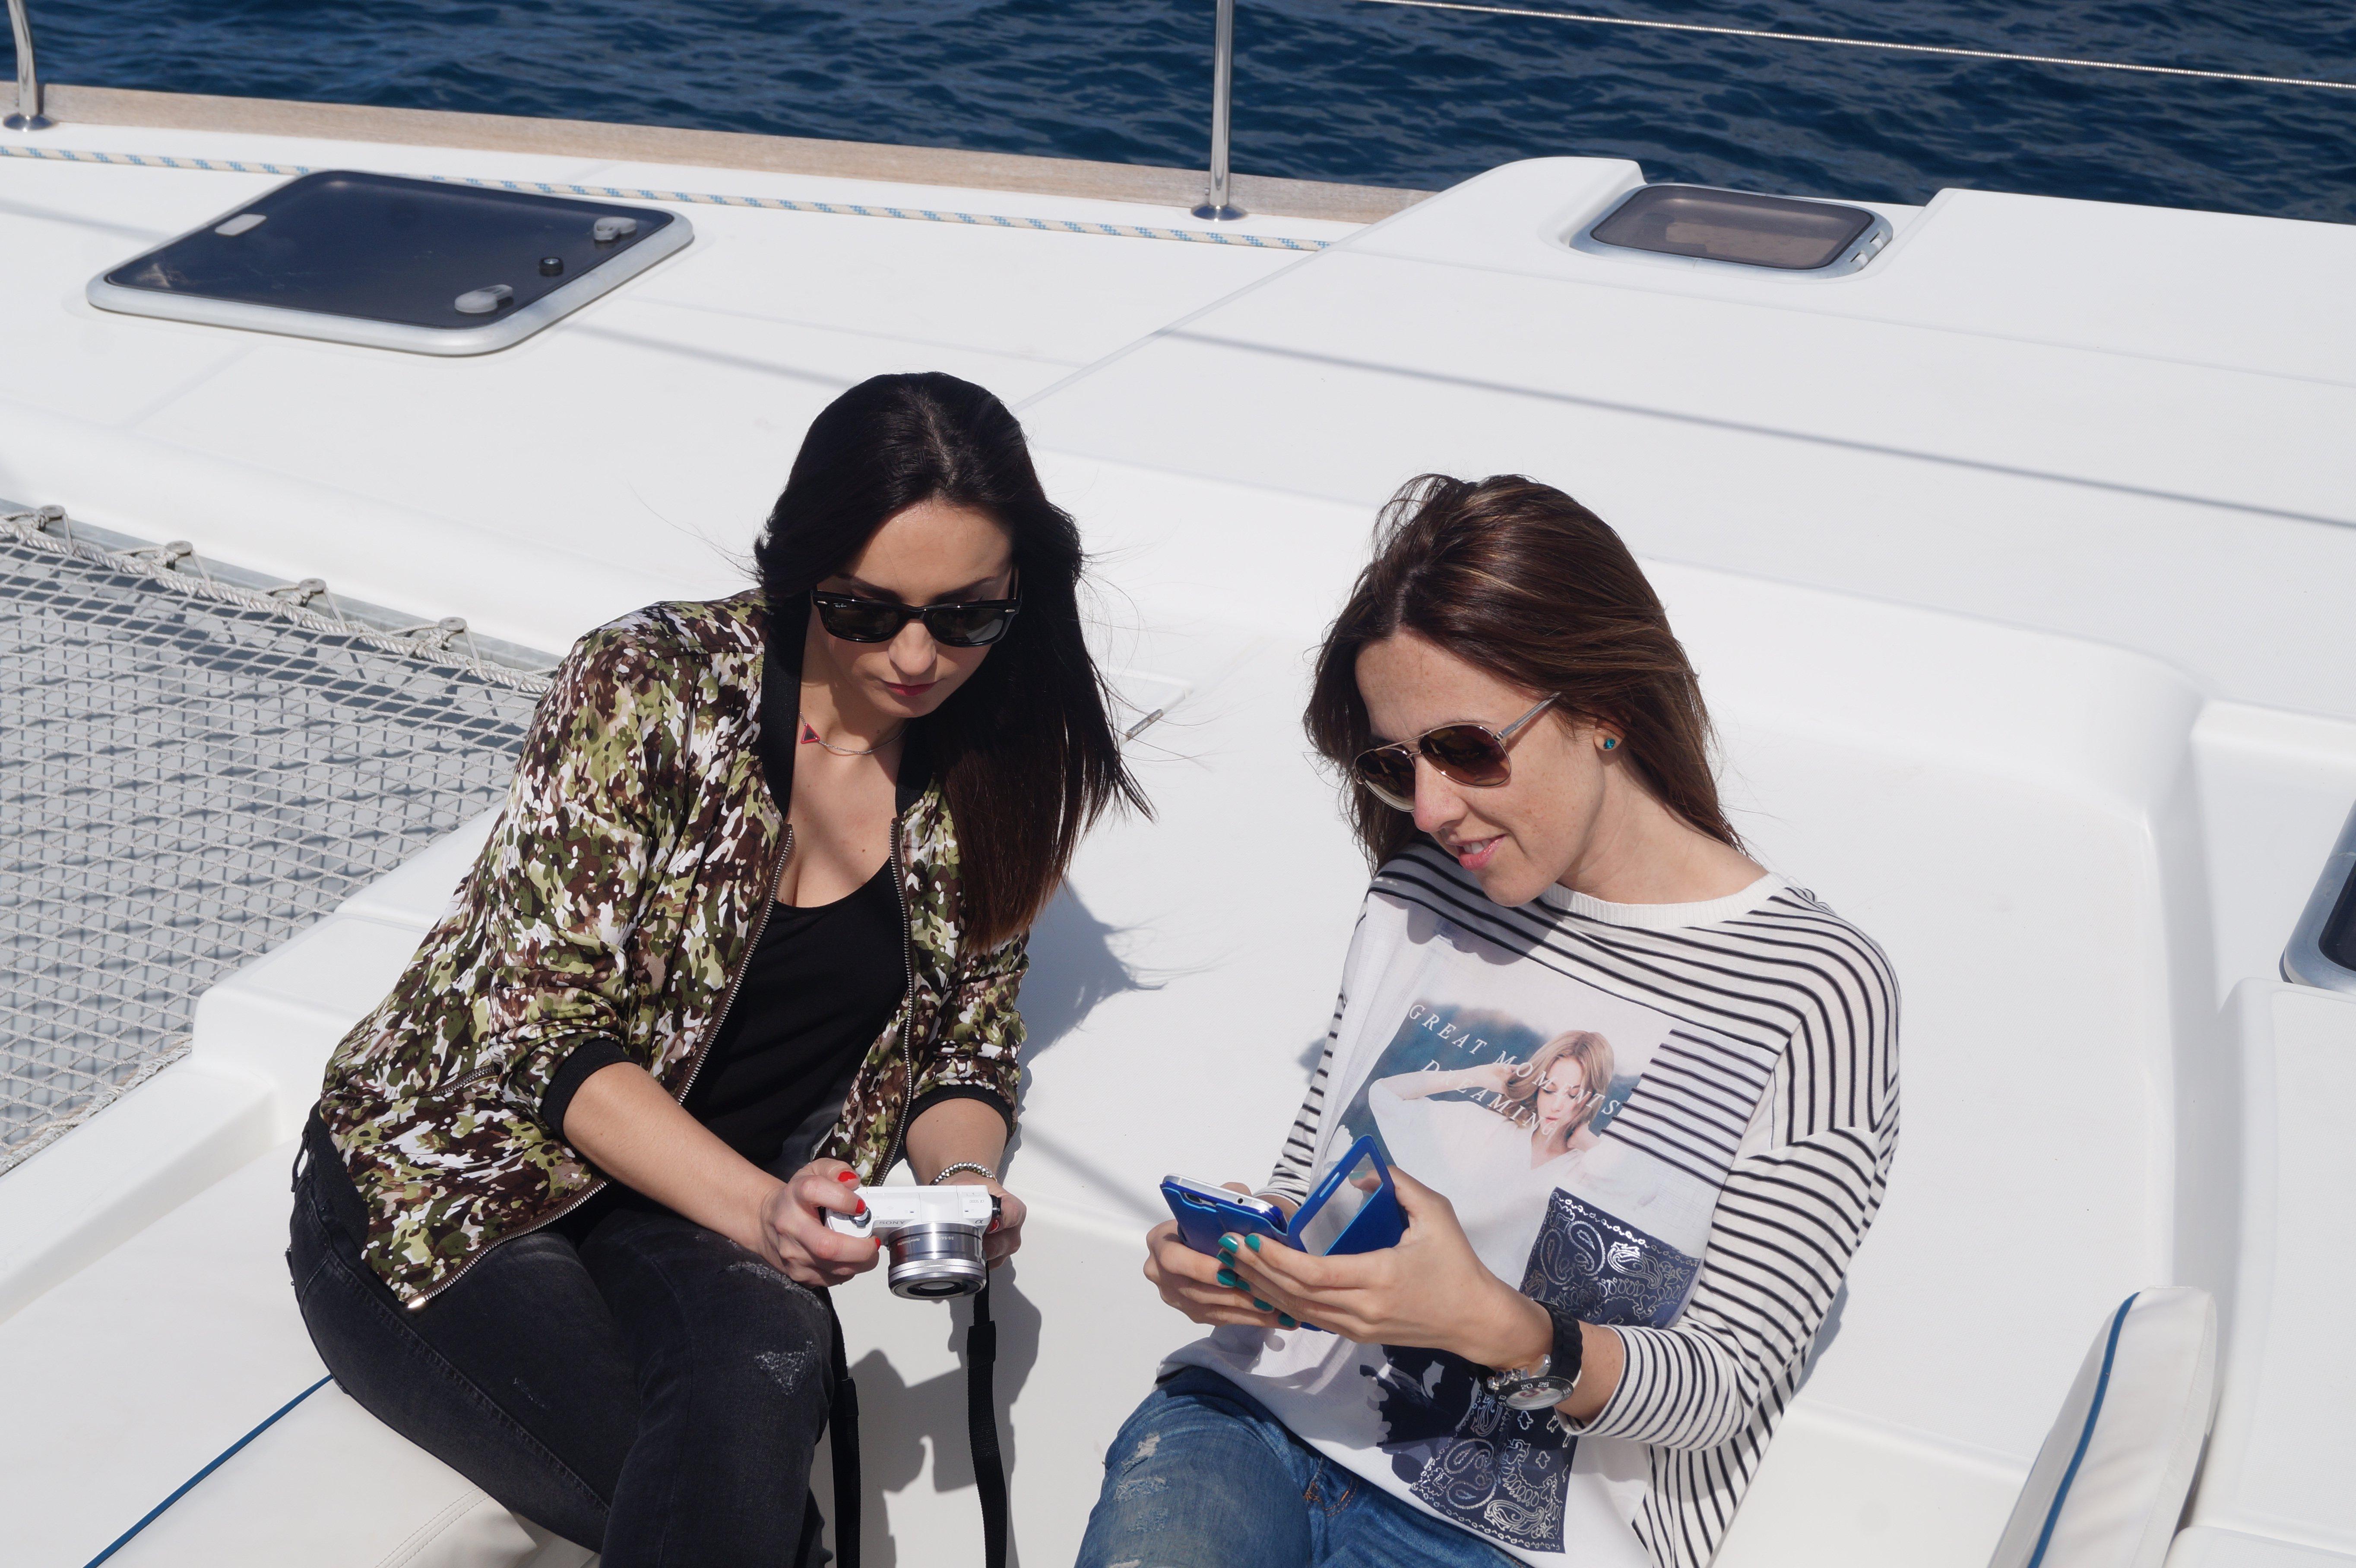 bloggers #SofíaIberostar Mallorca